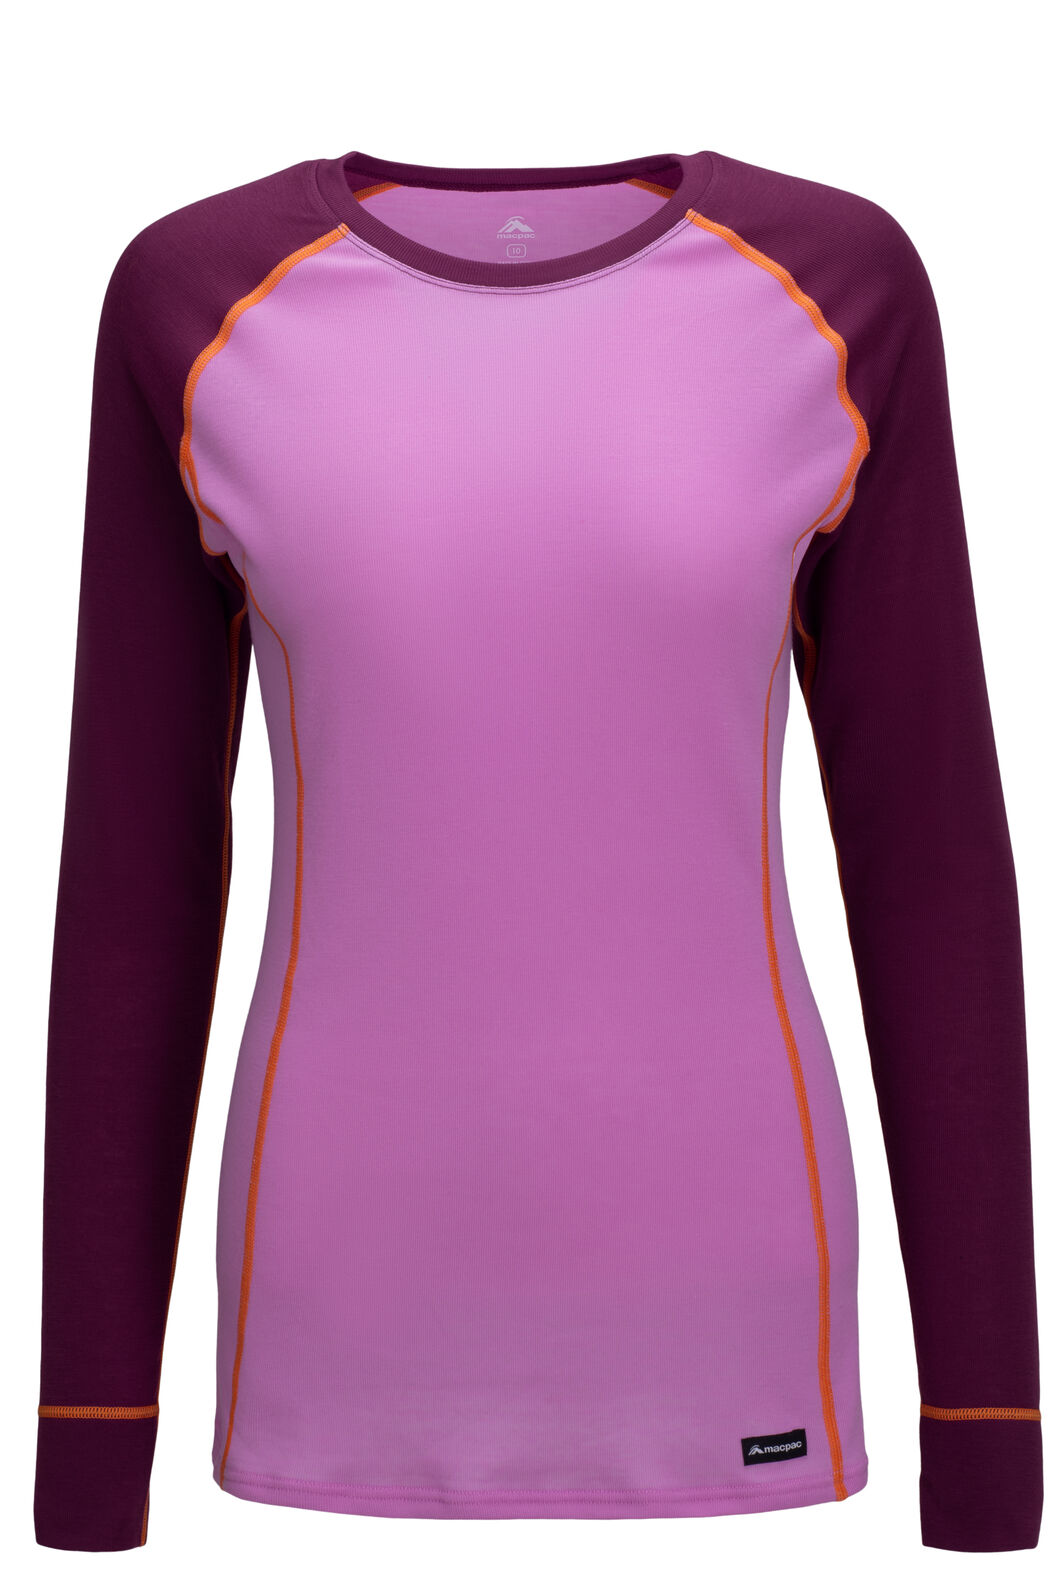 Macpac Geothermal Long Sleeve Top — Women's, Amaranth/Orchid, hi-res